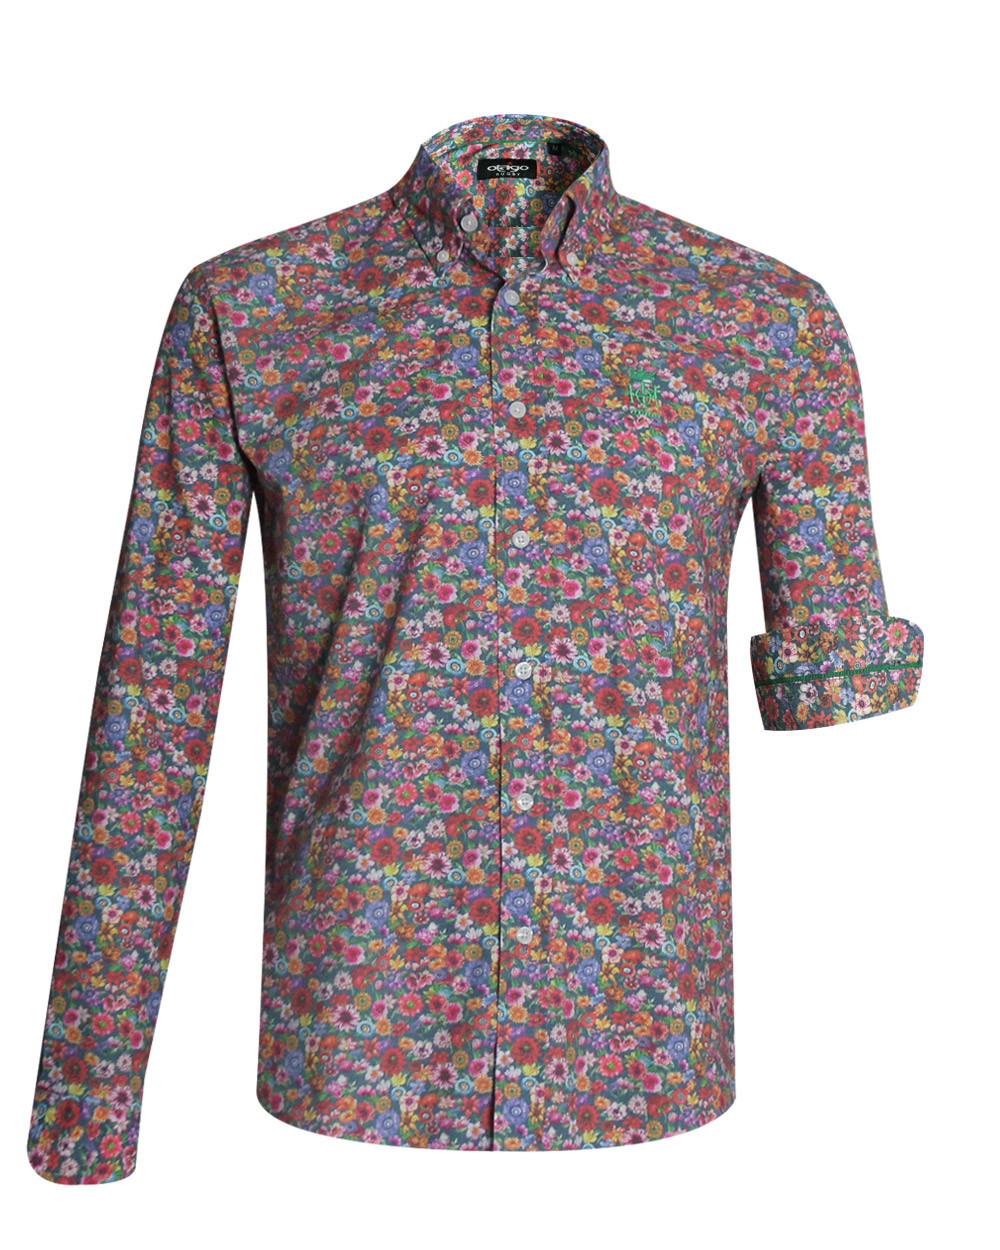 Chemise 121 manches longues Otago rugby à motifs multicolores homme